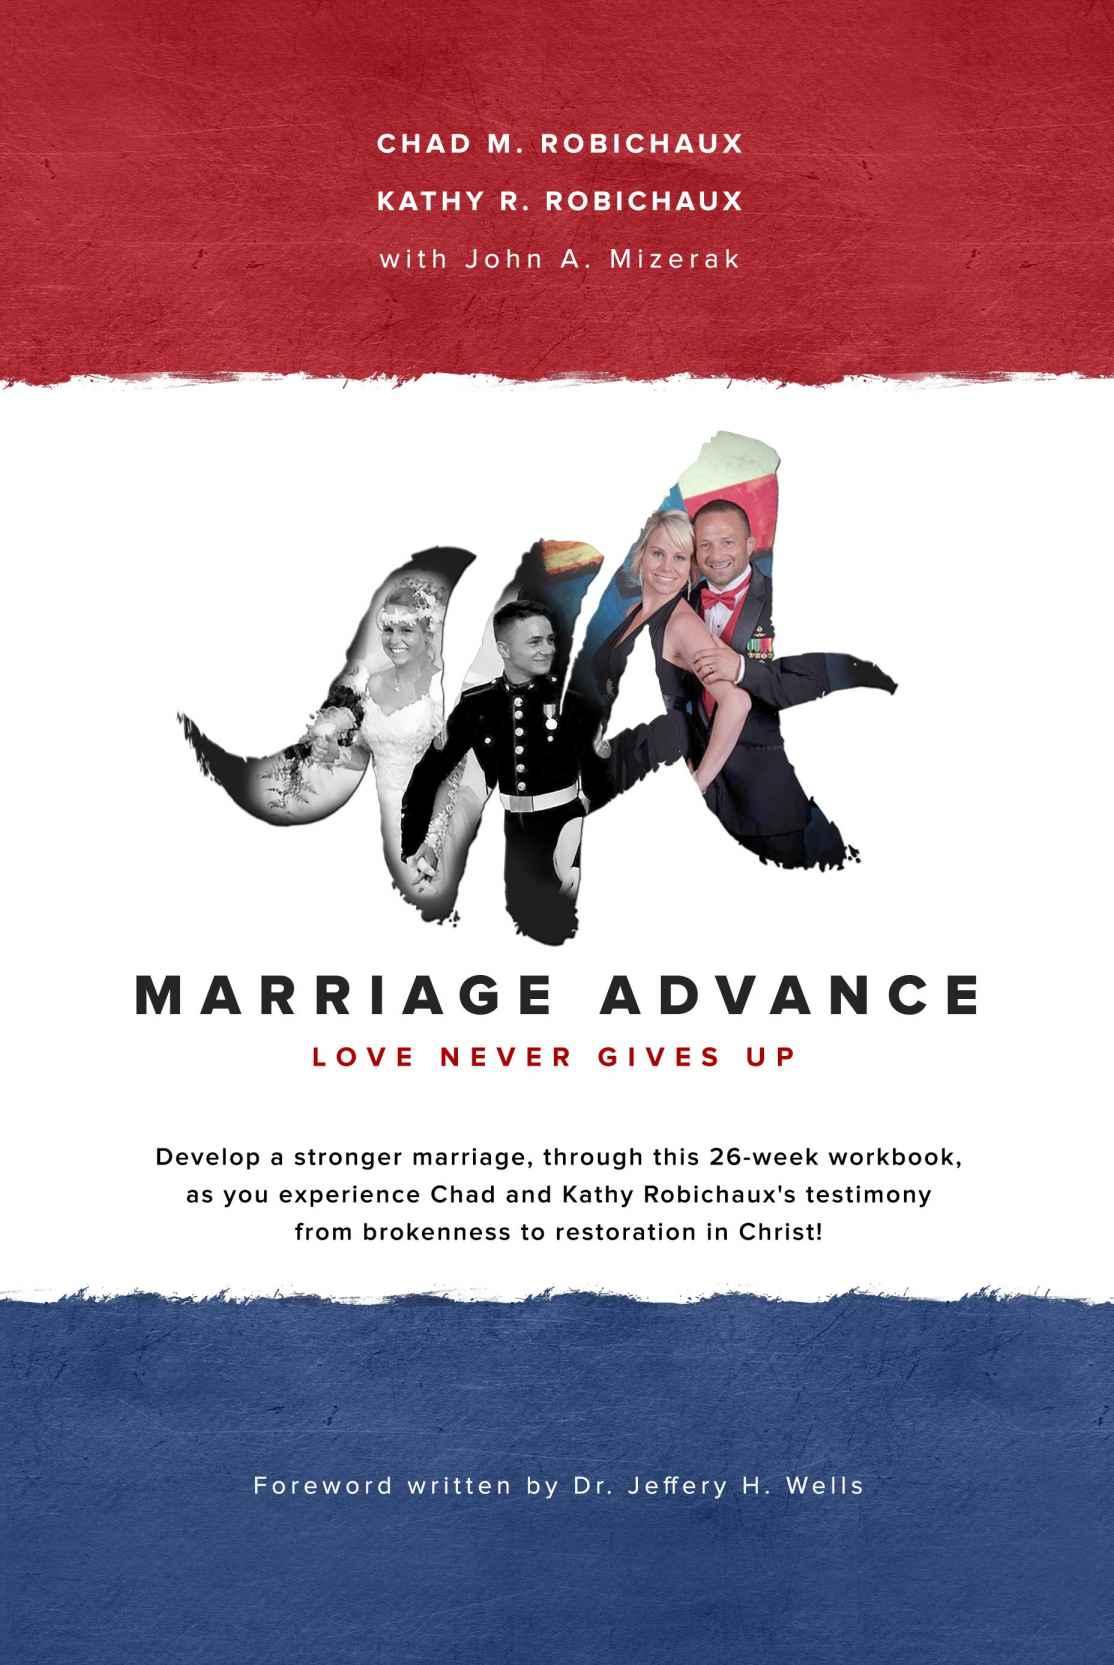 Marriage Advance.jpg